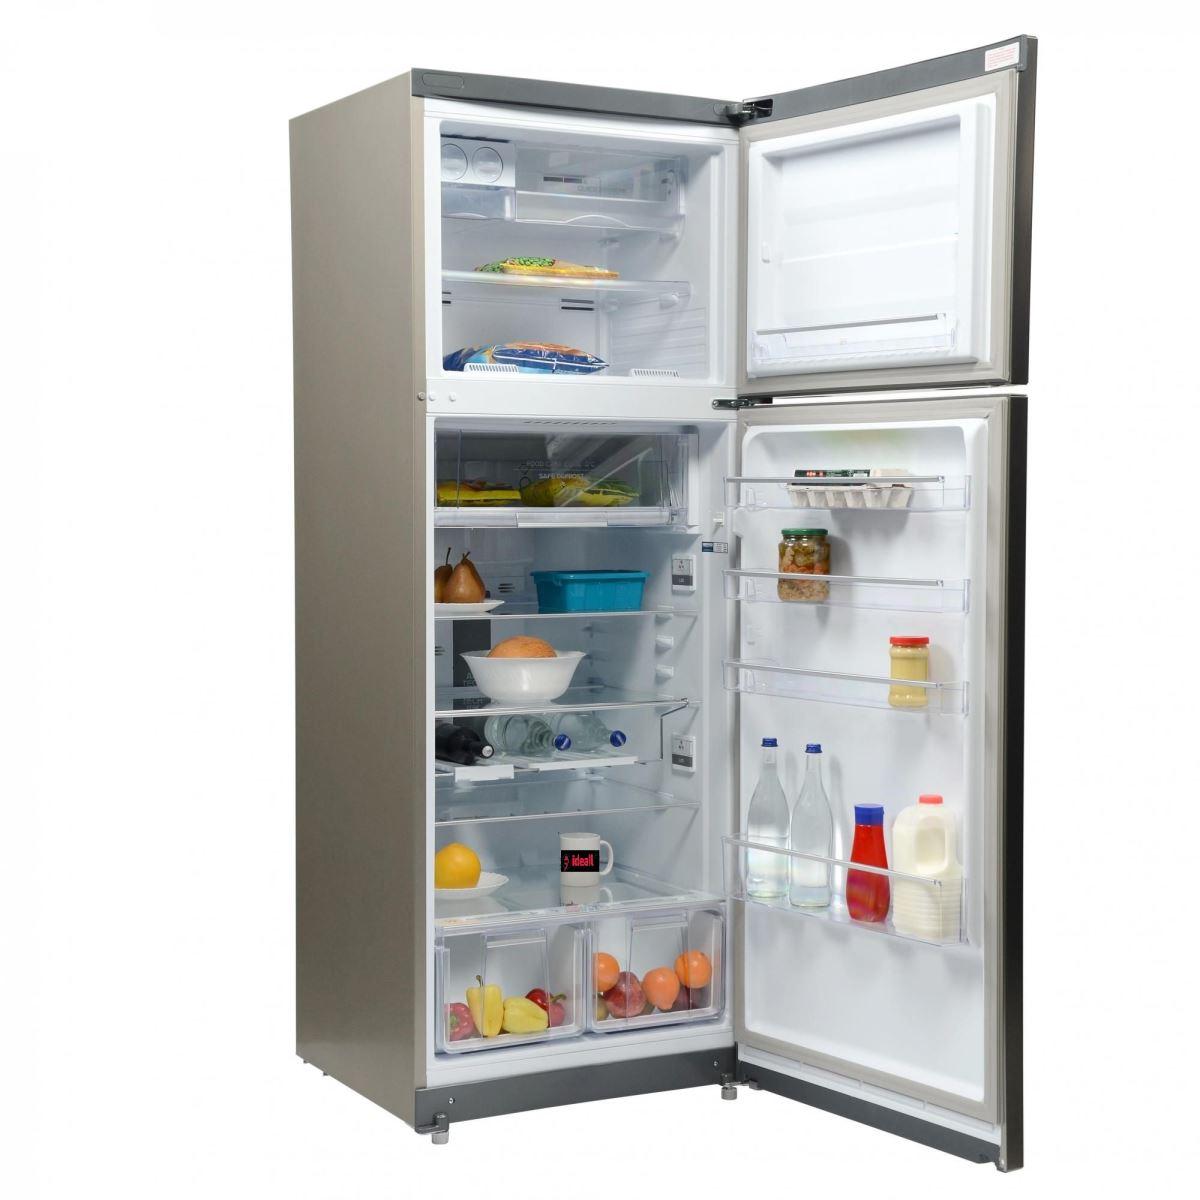 Холодильники Hotpoint Ariston _ лучши модели ТОП-ового бренда на рынке Украины - Hotpoint-Ariston ENXTY 19222 X FW